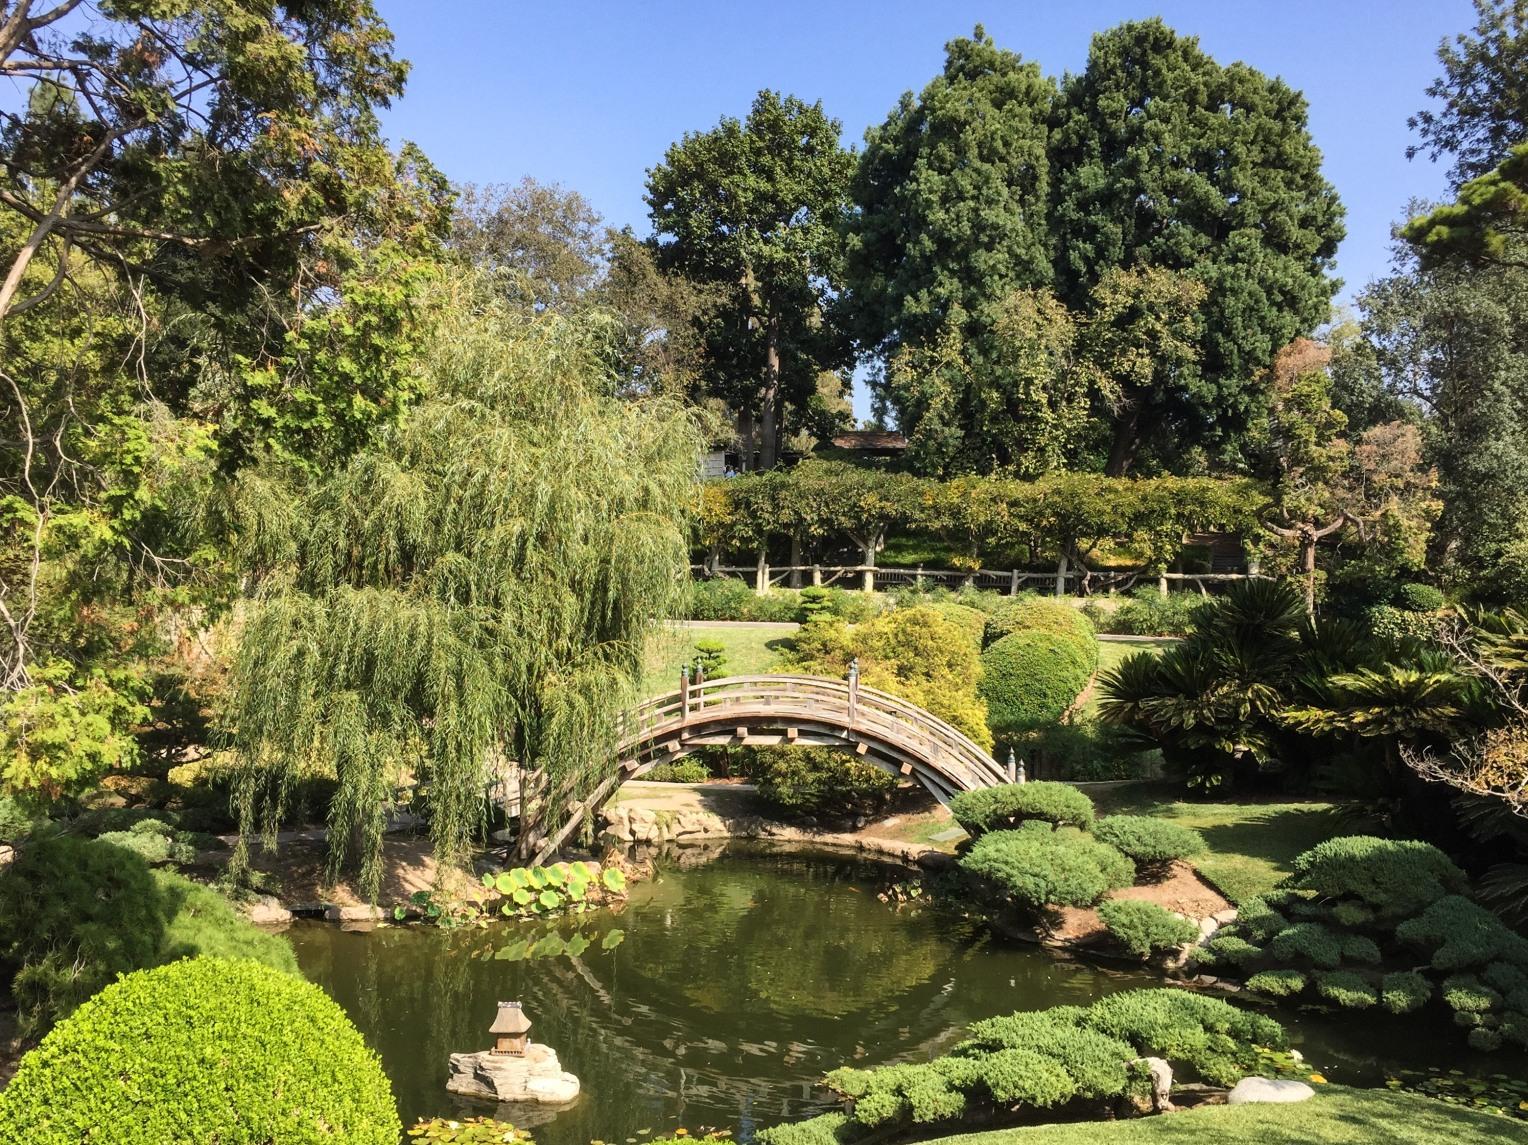 huntington-japanese-garden-9072